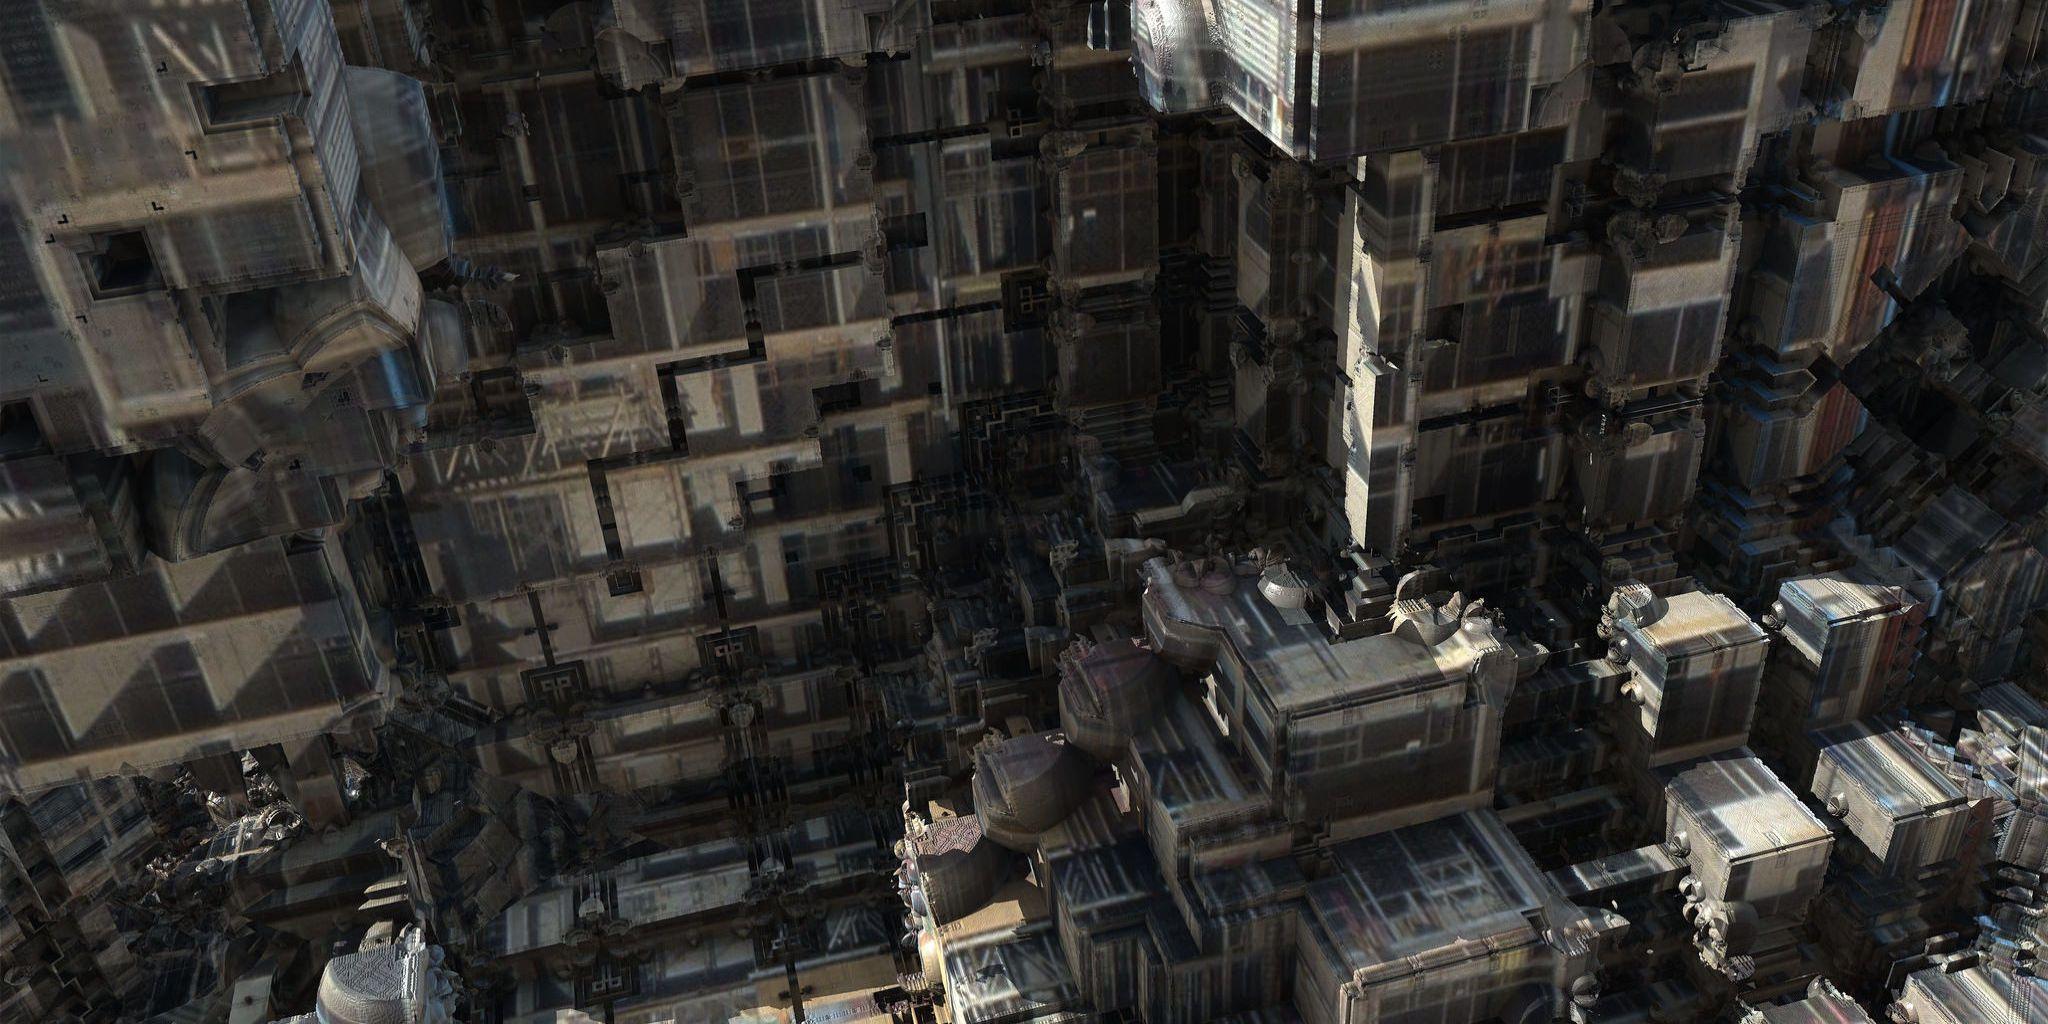 An Algorithm Built These Dystopian Cityscapes